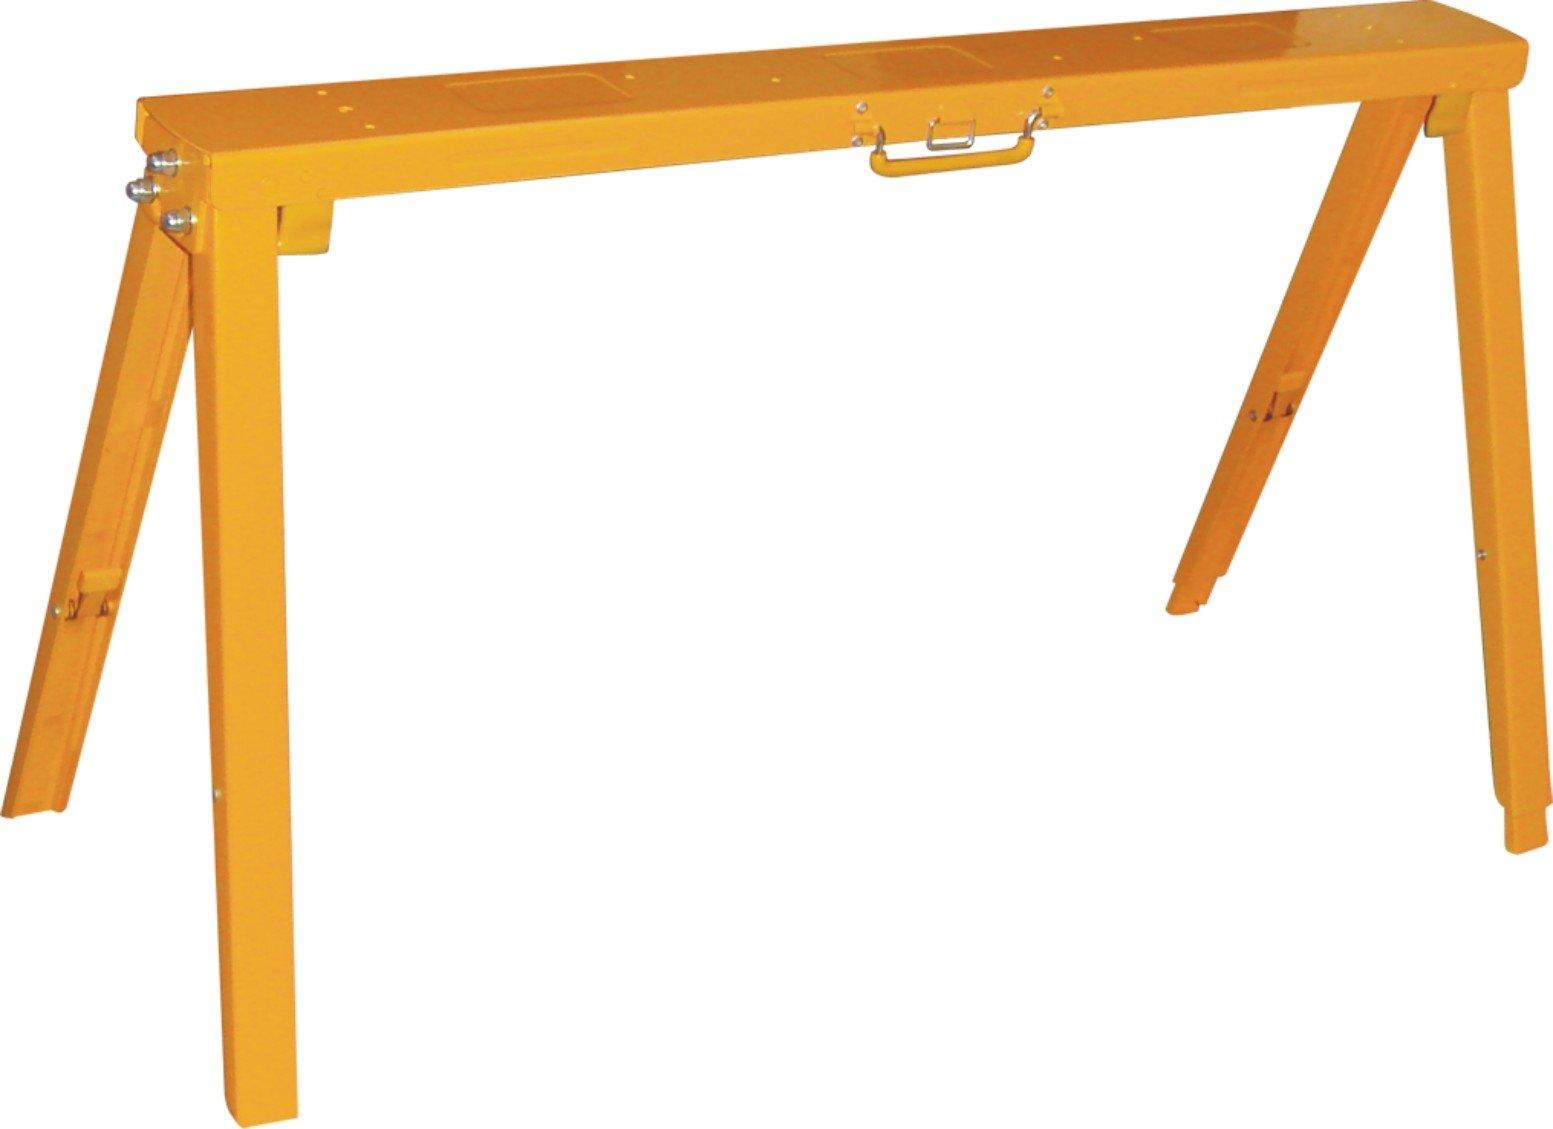 YourTools Y2SH Adjustable FoldingHeavy Duty Sawhorse Work Stand, 1,200 lb Capacity